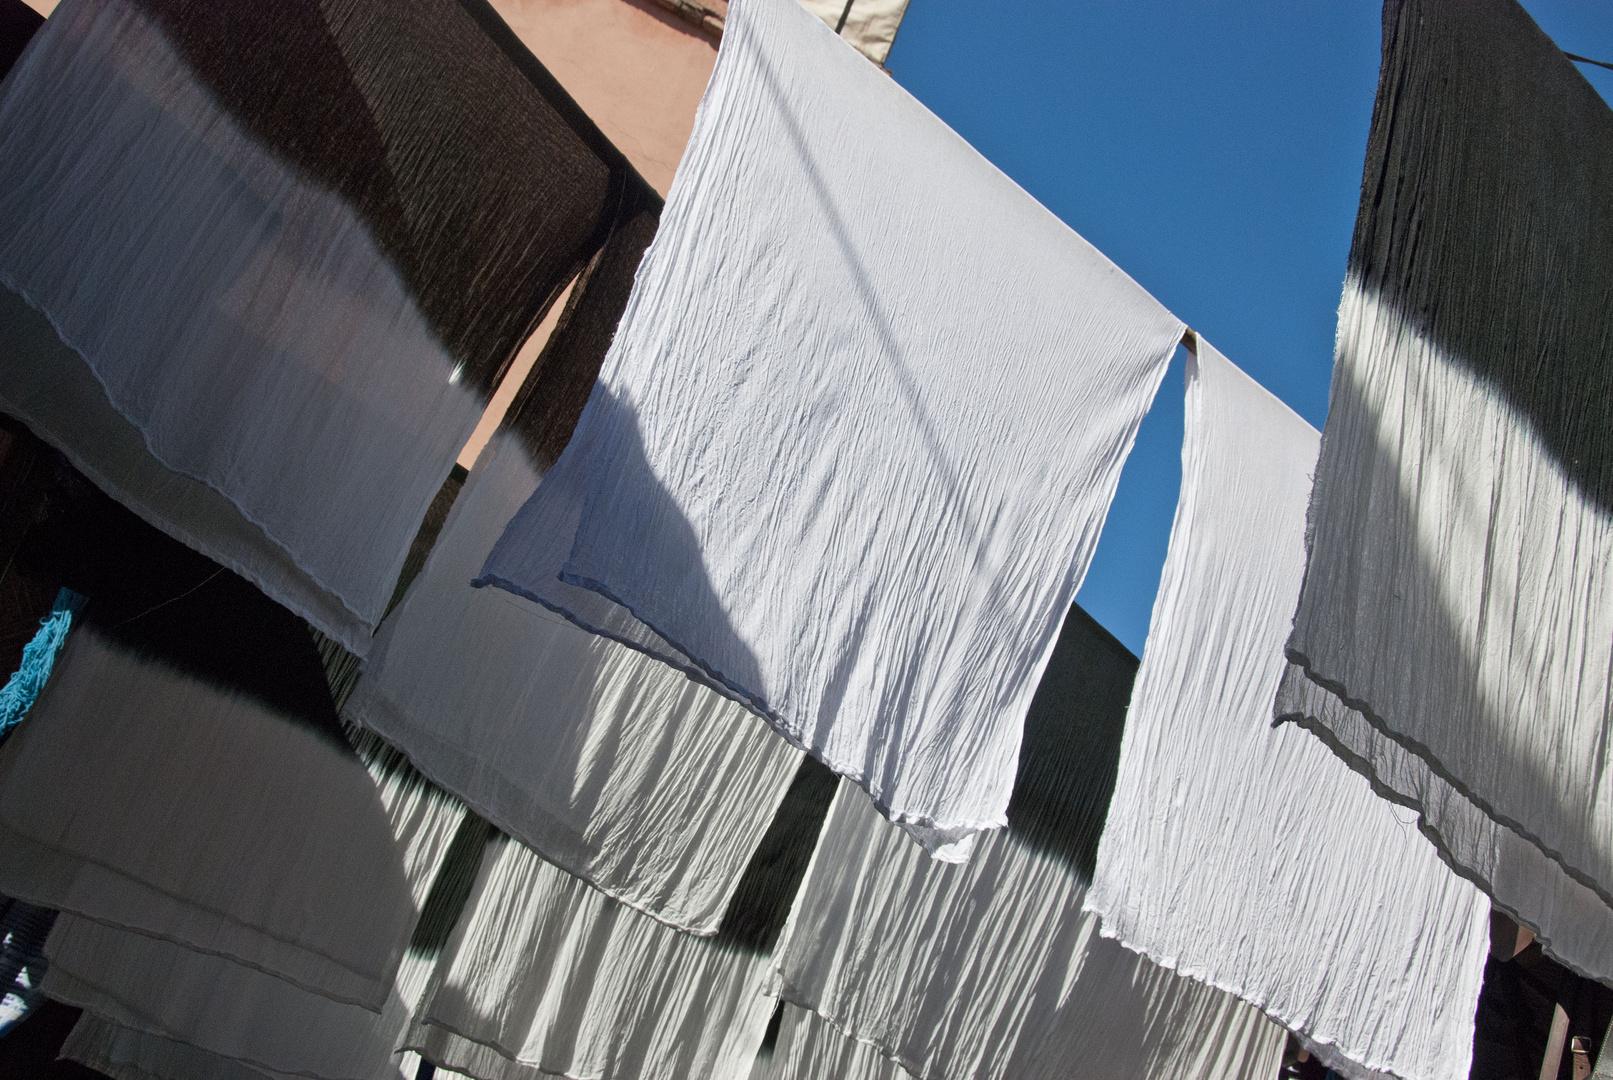 Marrakesh - Souk des Teinturiers - Wool Dyers - 02